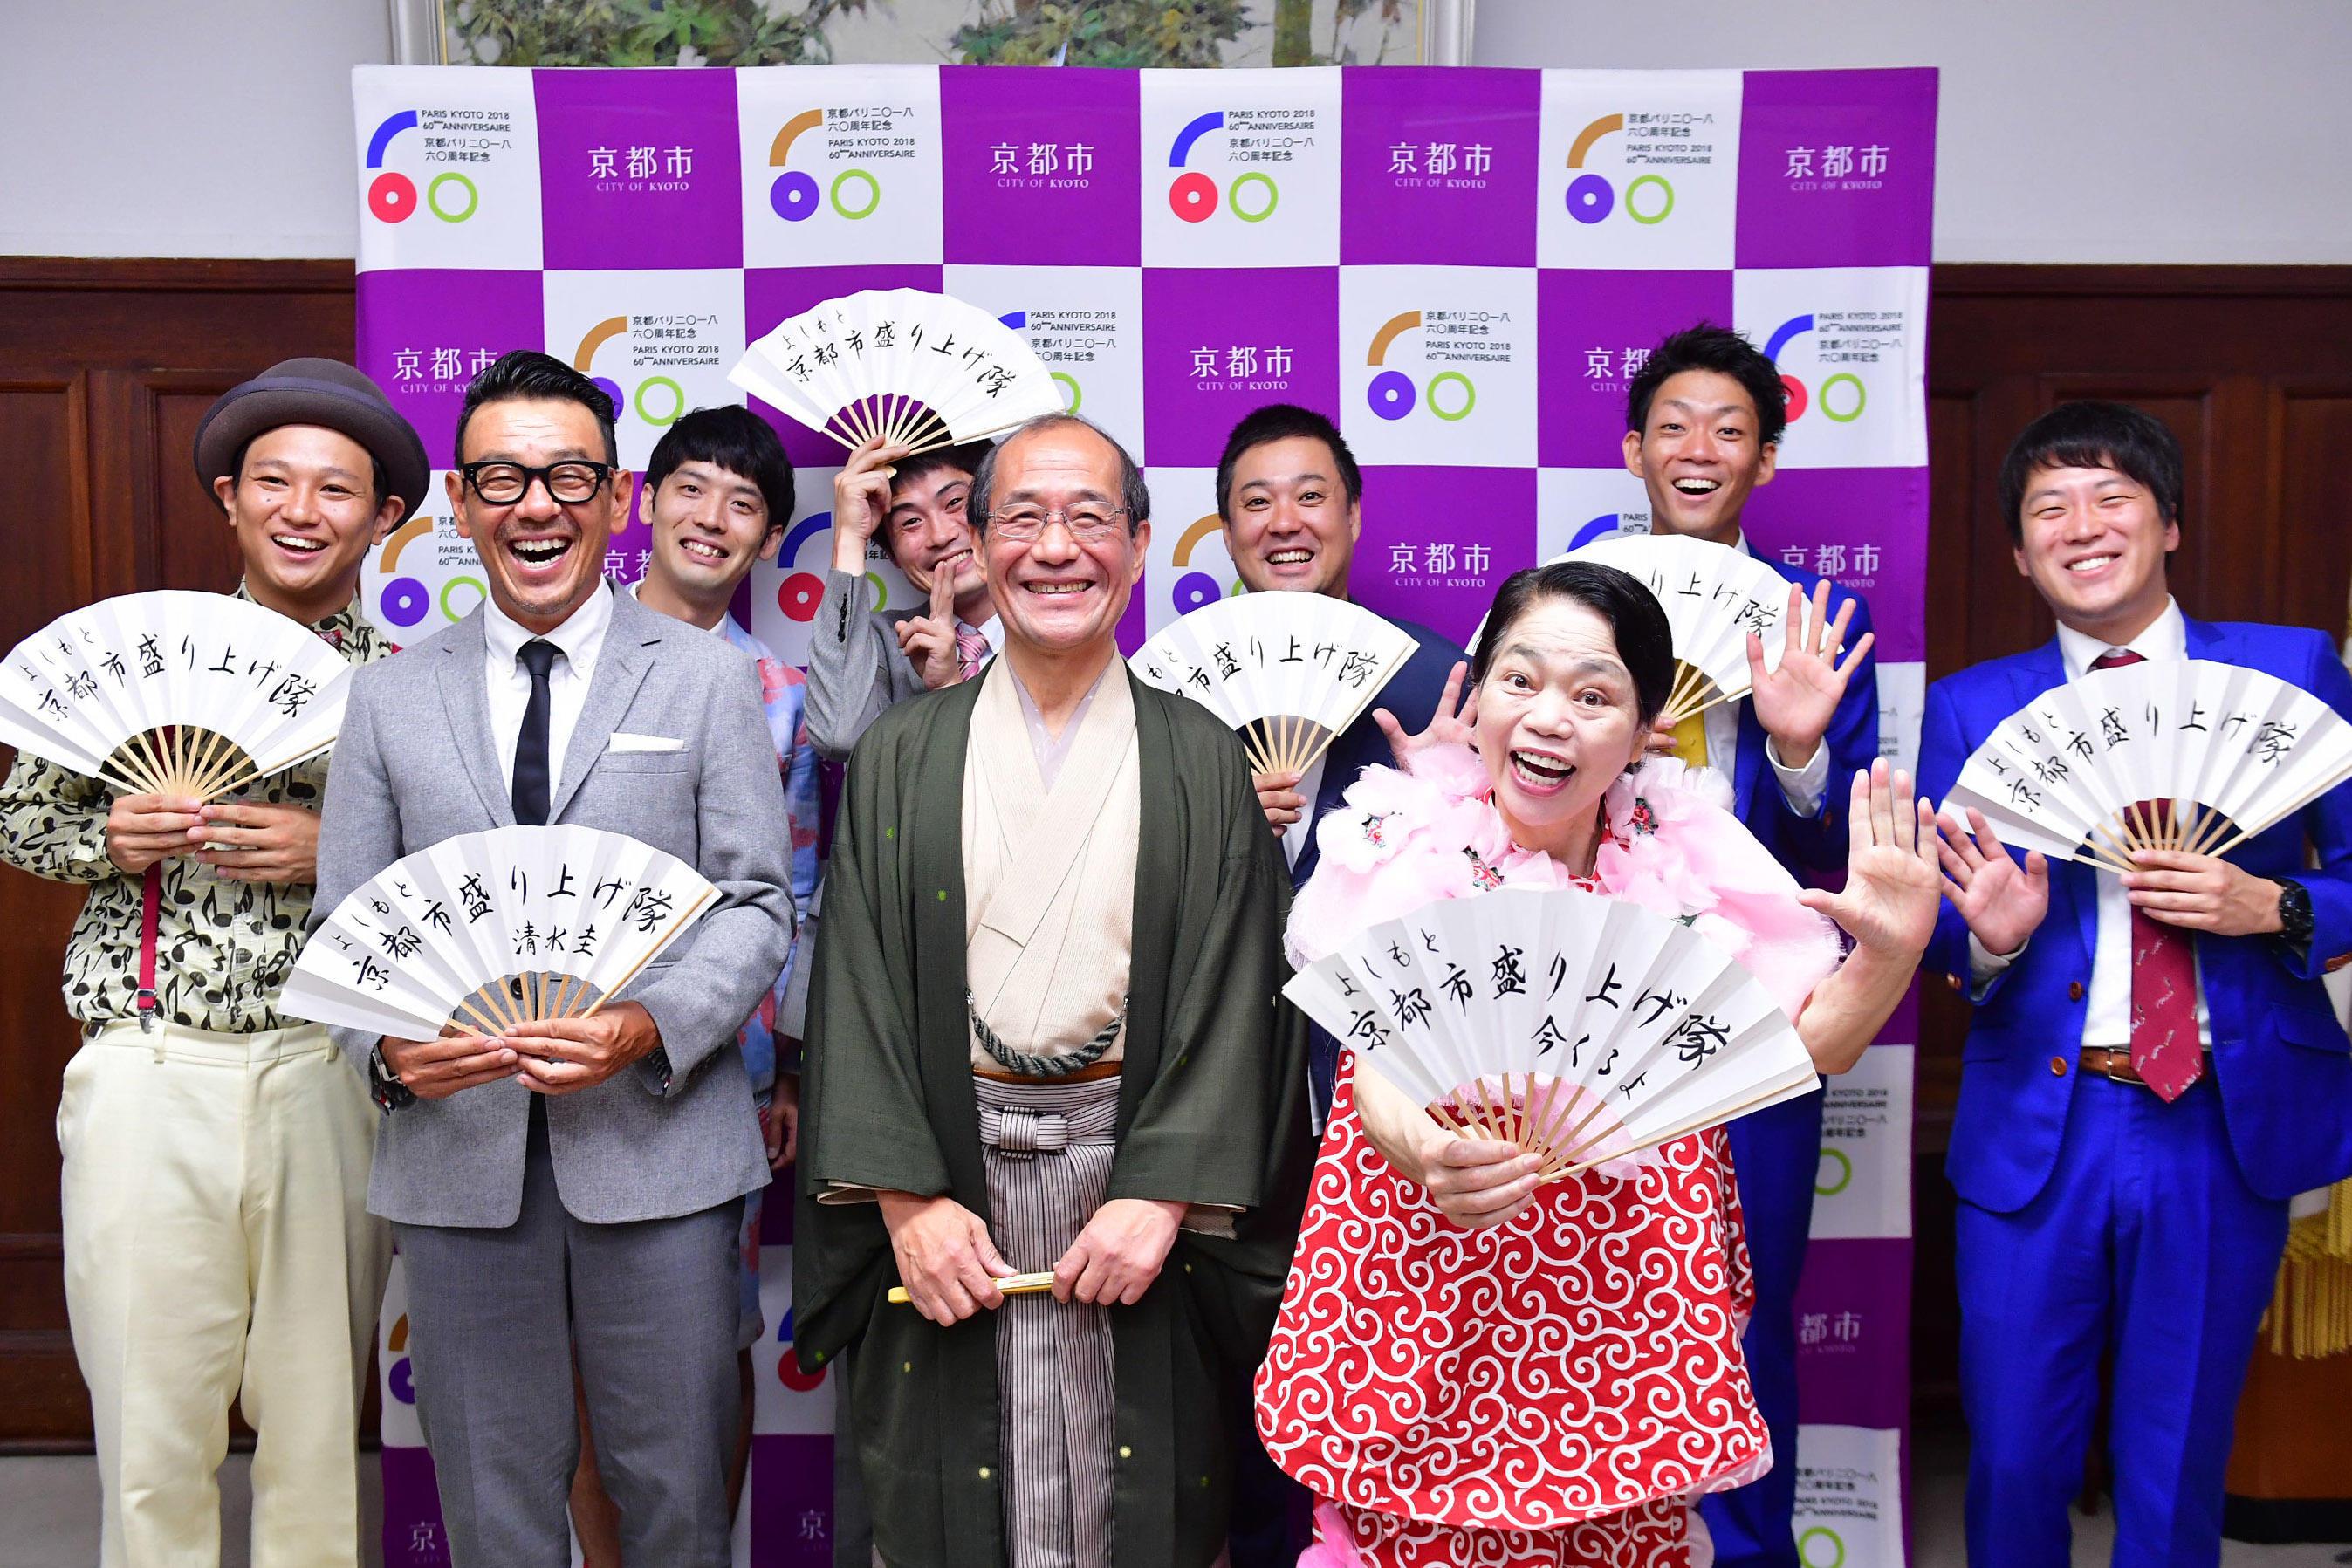 http://news.yoshimoto.co.jp/20180828182647-54935ab25e97d5bed4107e93043a7fdbd8b395ef.jpg